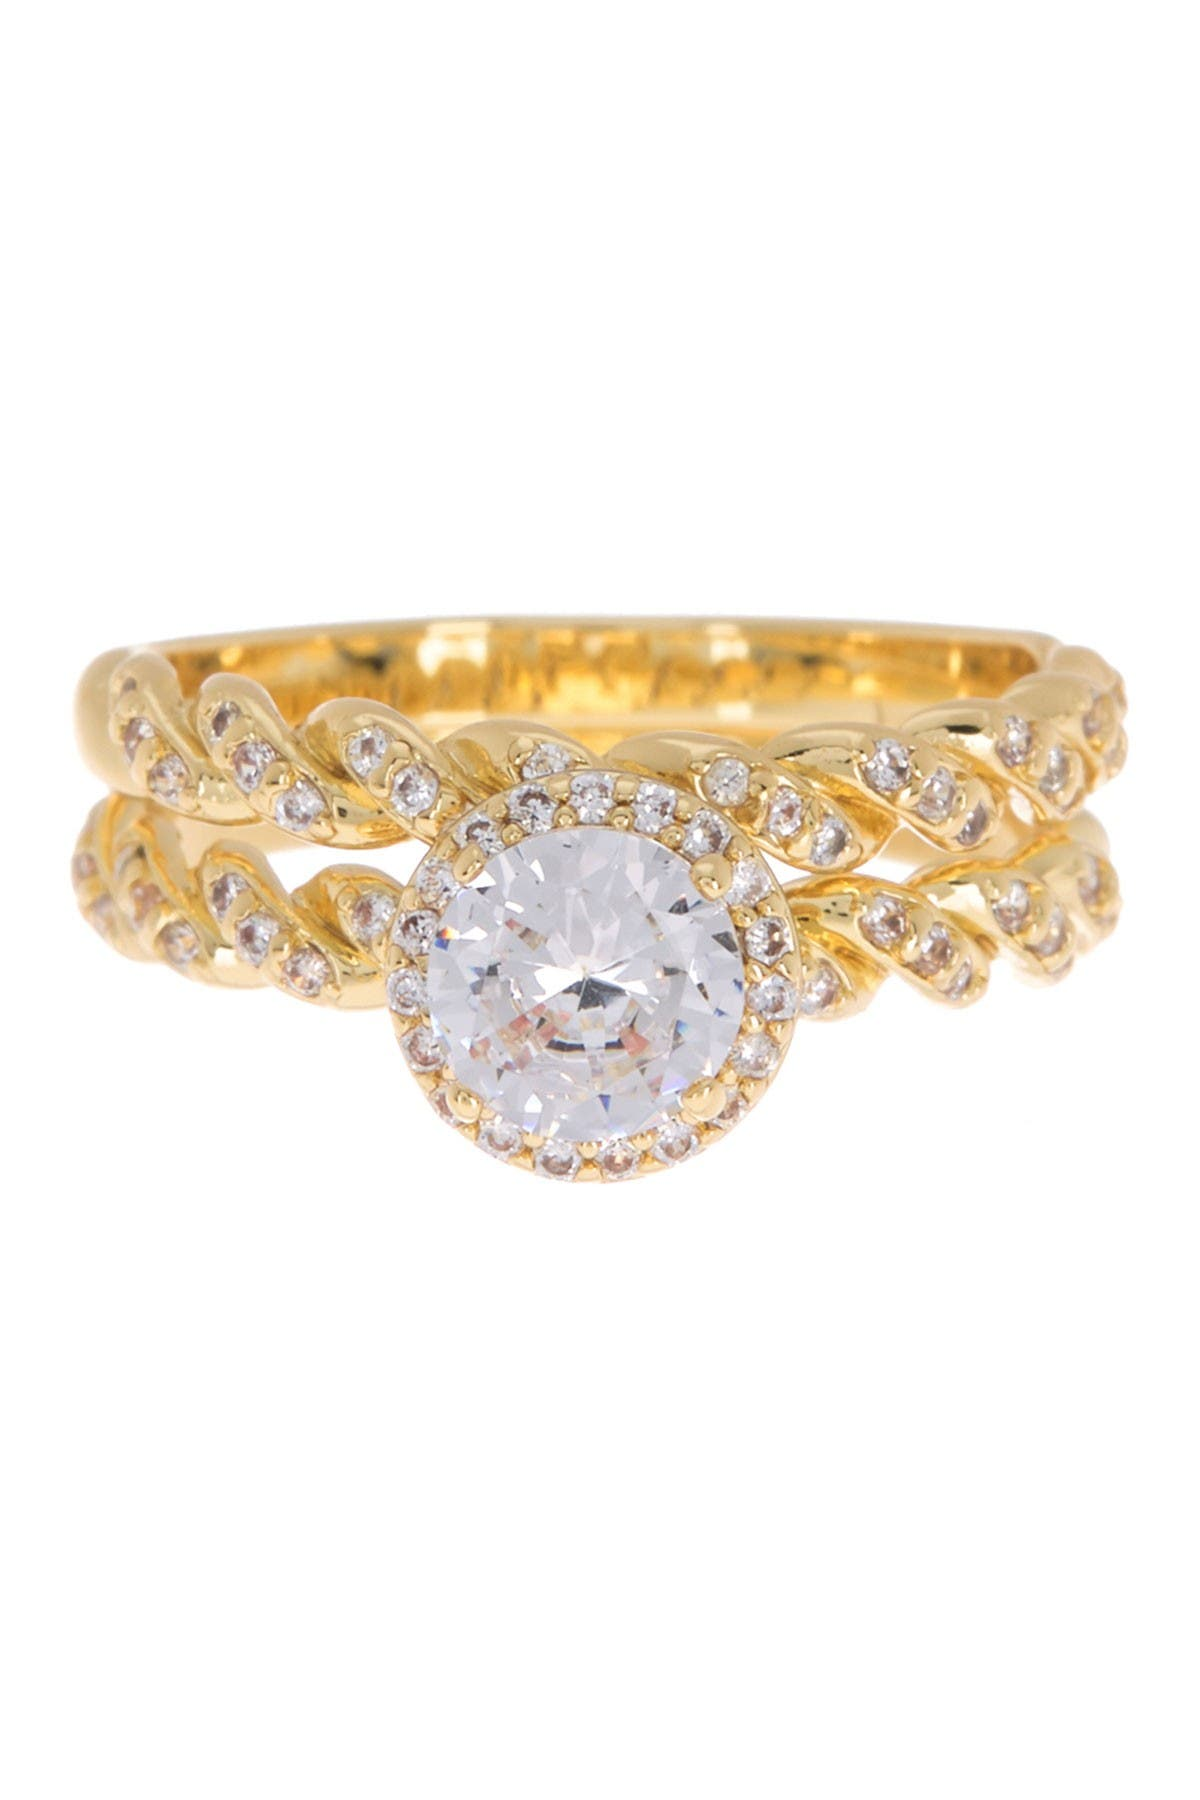 Image of Covet Twist Pave Engagement Ring Set